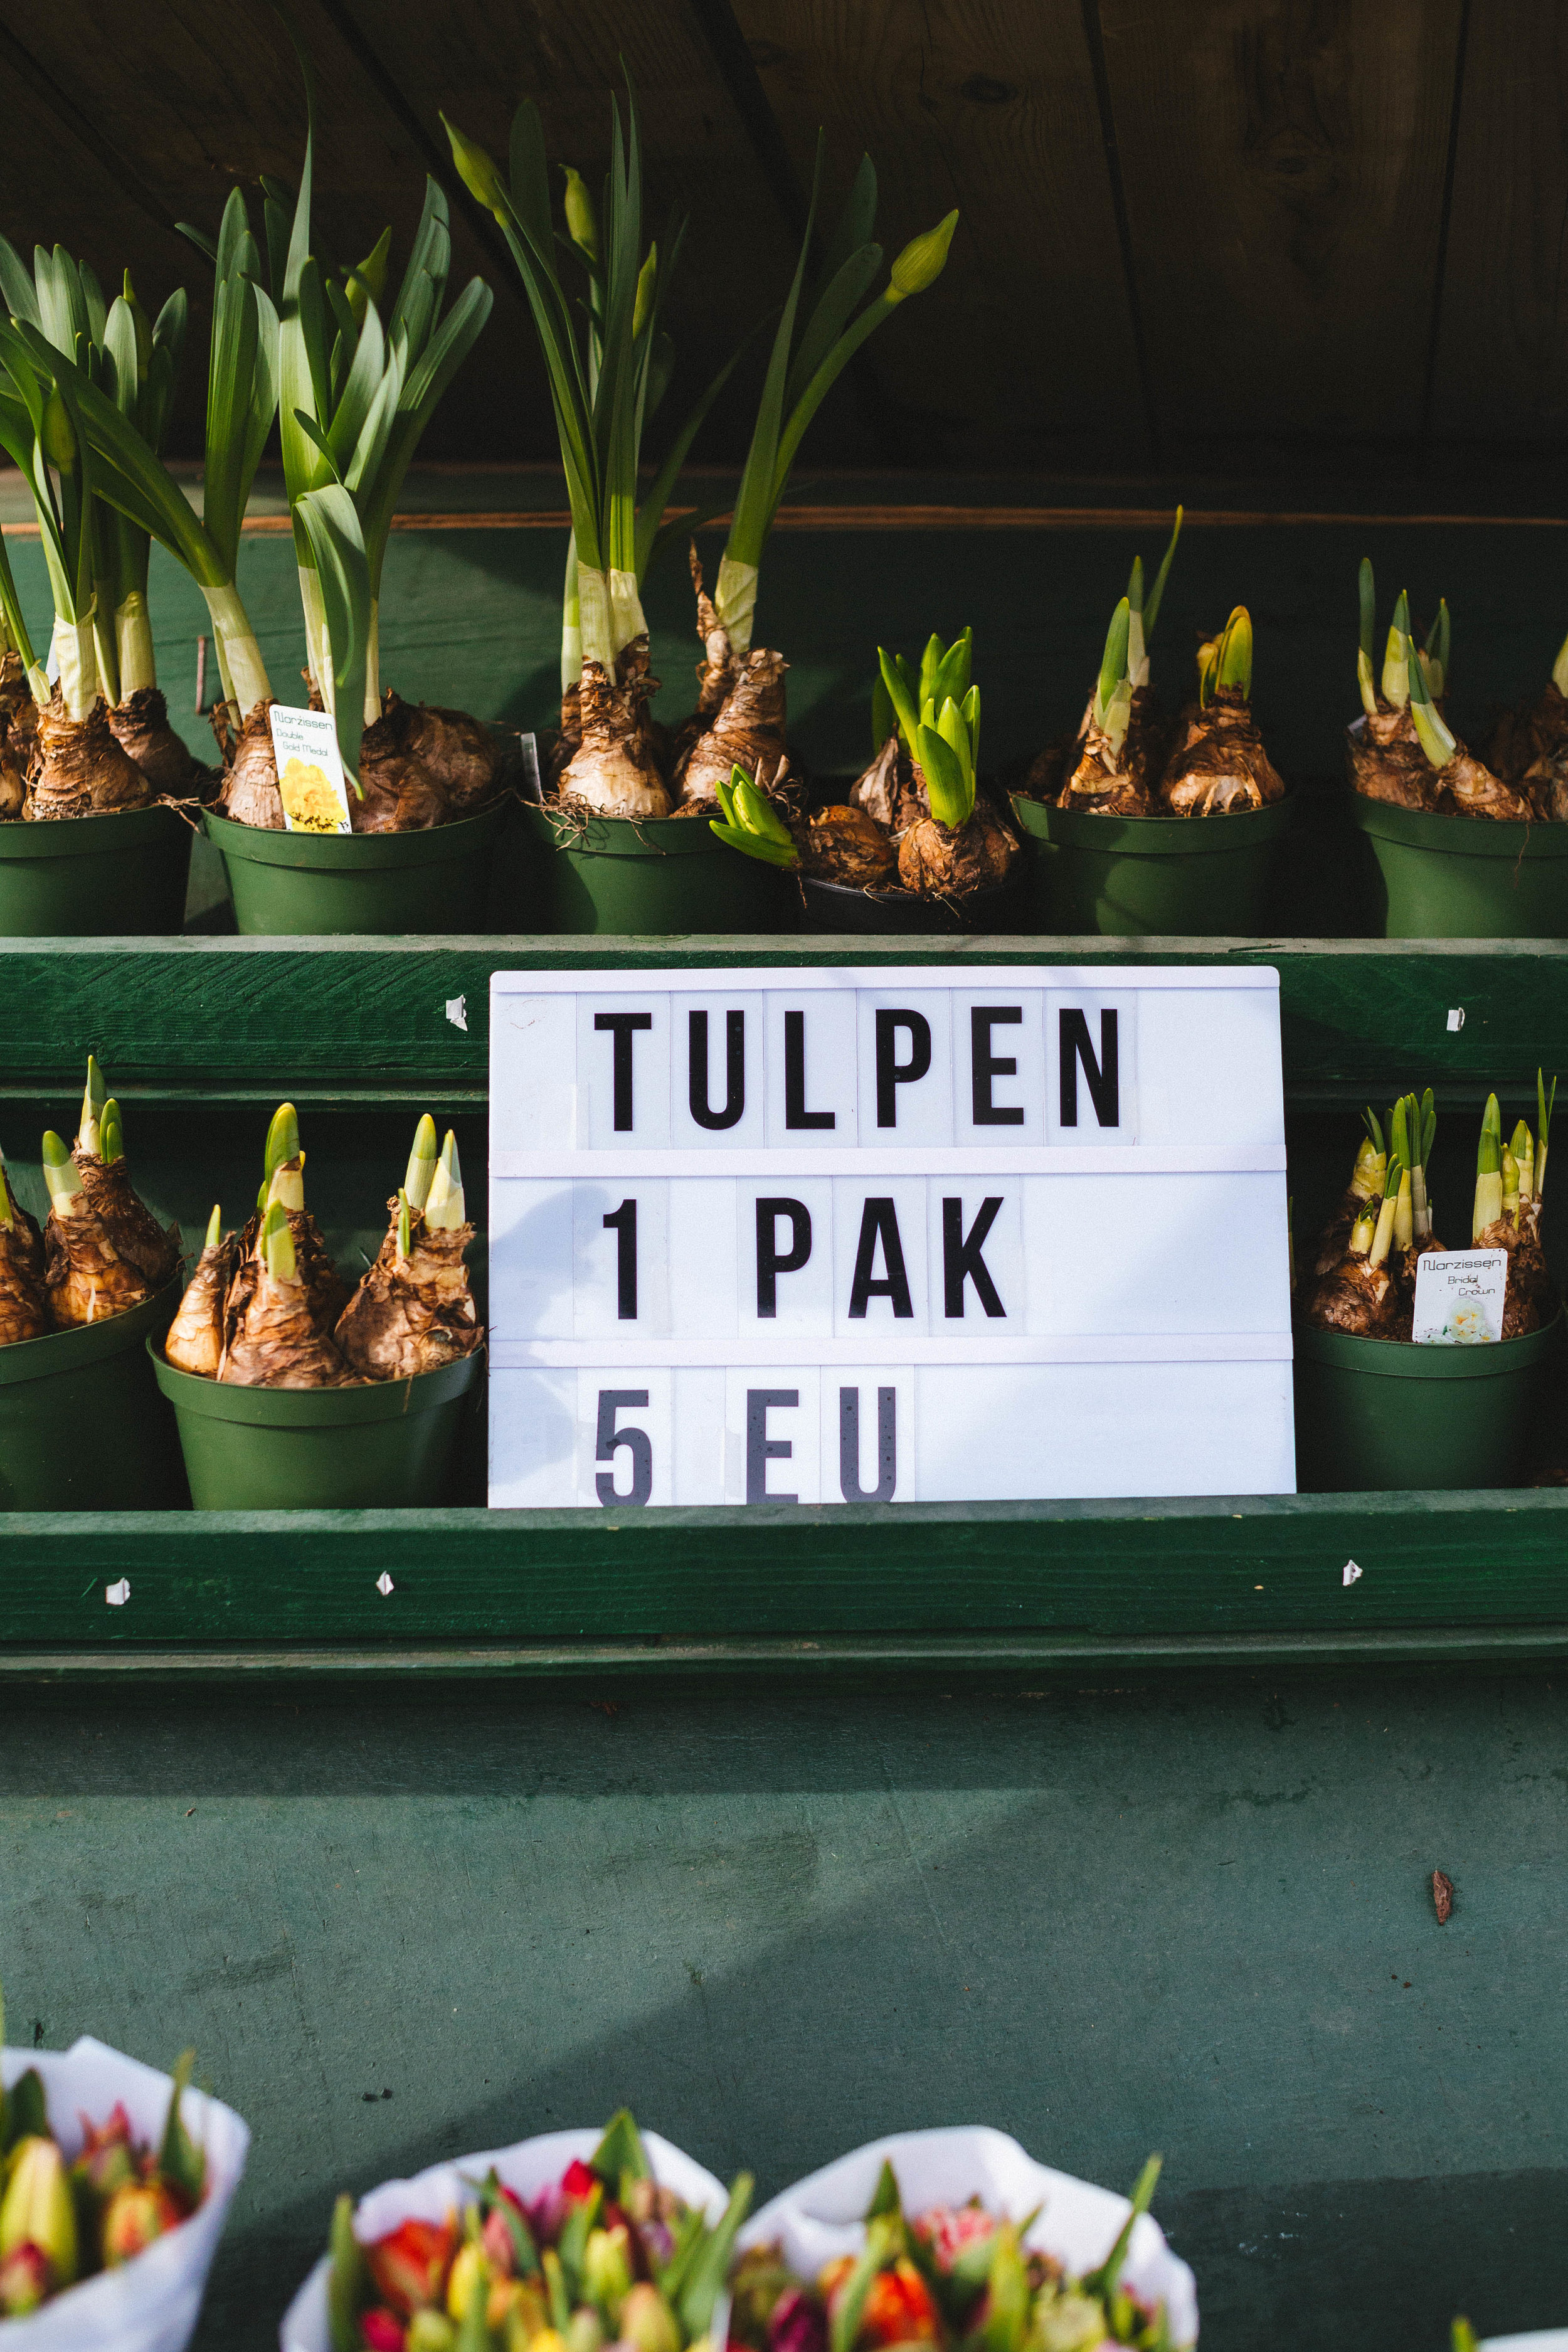 tulips-roadside-stand-hillegom.jpg